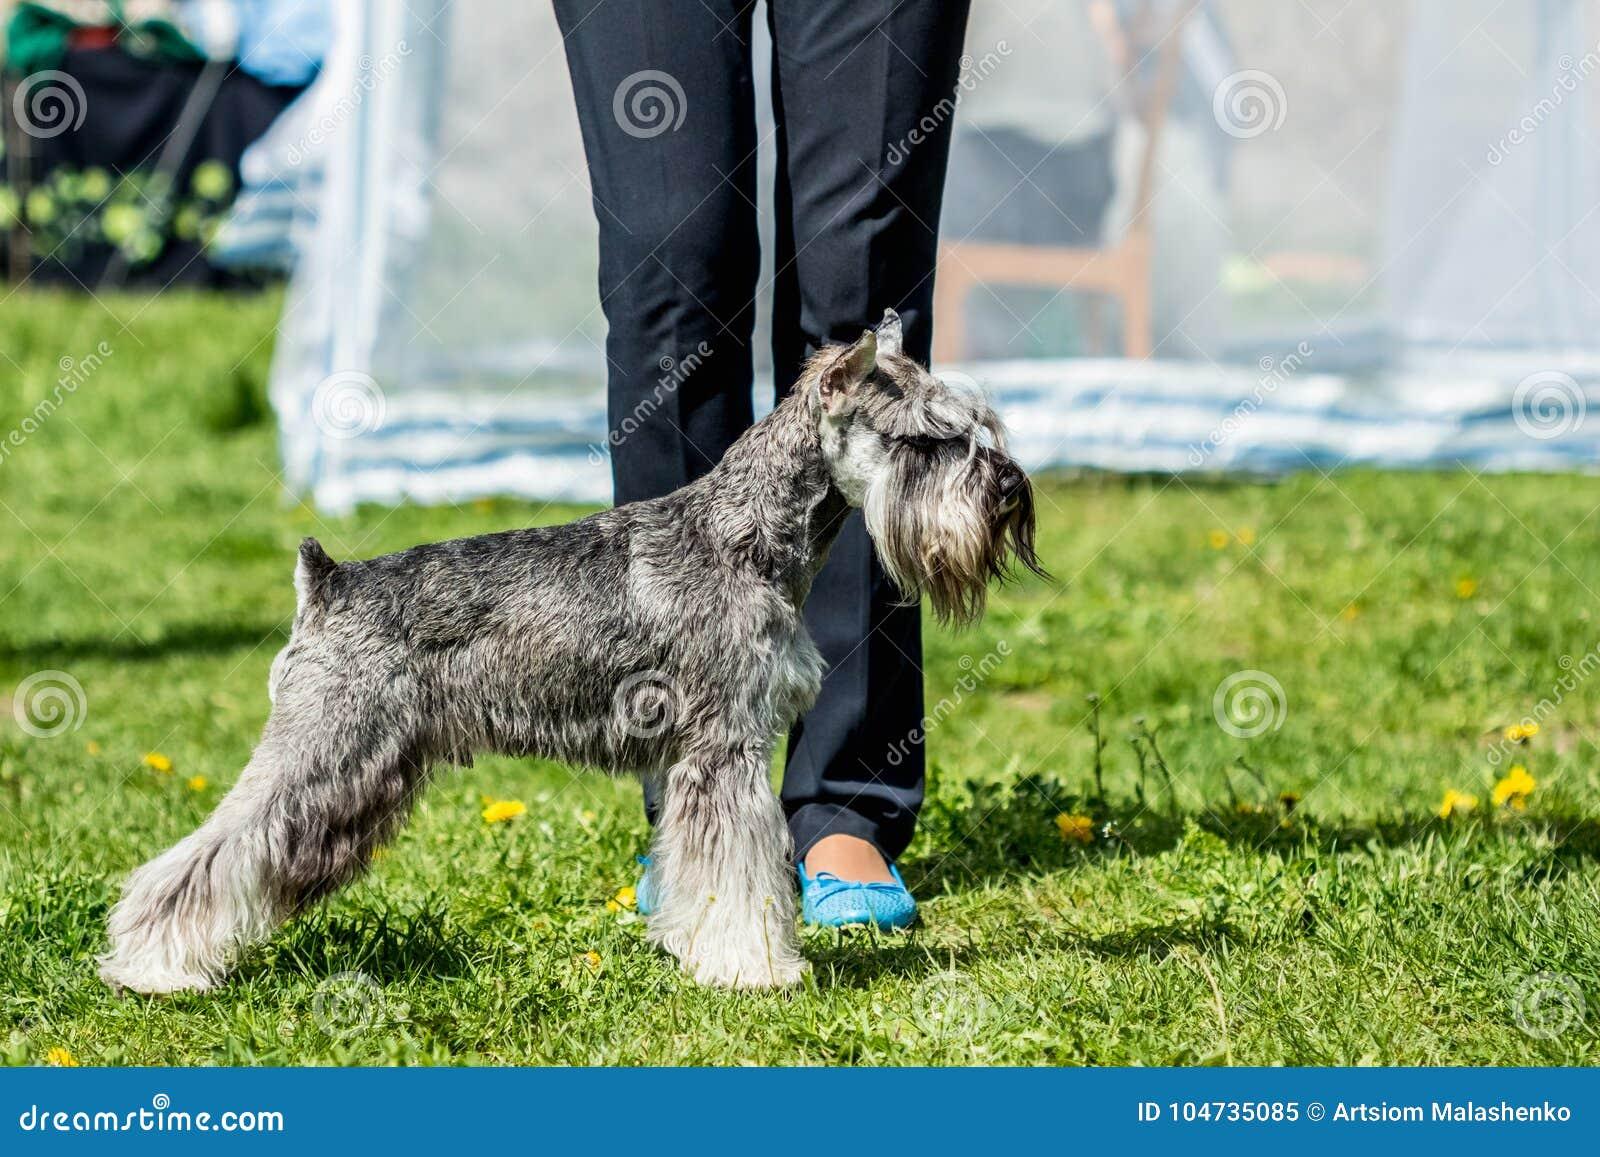 Miniature Schnauzer Zwergschnauzer gray dog stands in the green